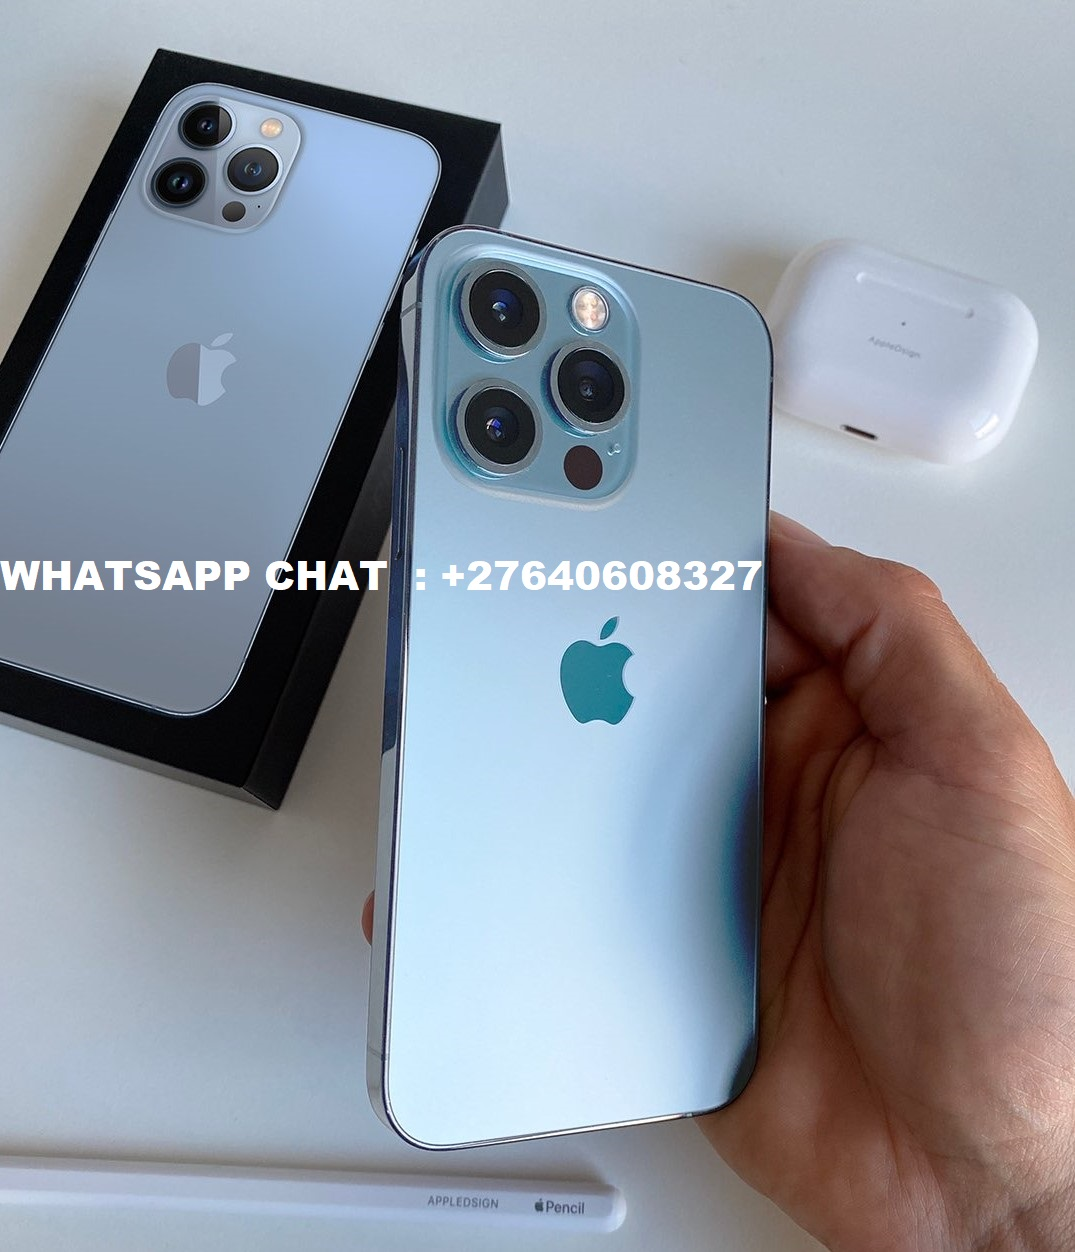 Apple iPhone 13 Pro 128GB = 700 EUR , iPhone 13 Pro Max 128GB = 750 EUR, iPhone 13 128GB = 550 EUR, iPhone 12 Pro 128GB = 500 EUR, iPhone 12 Pro Max 128GB = 550 EUR, Samsung Galaxy S21 Ultra 5G 128GB = 520 EUR